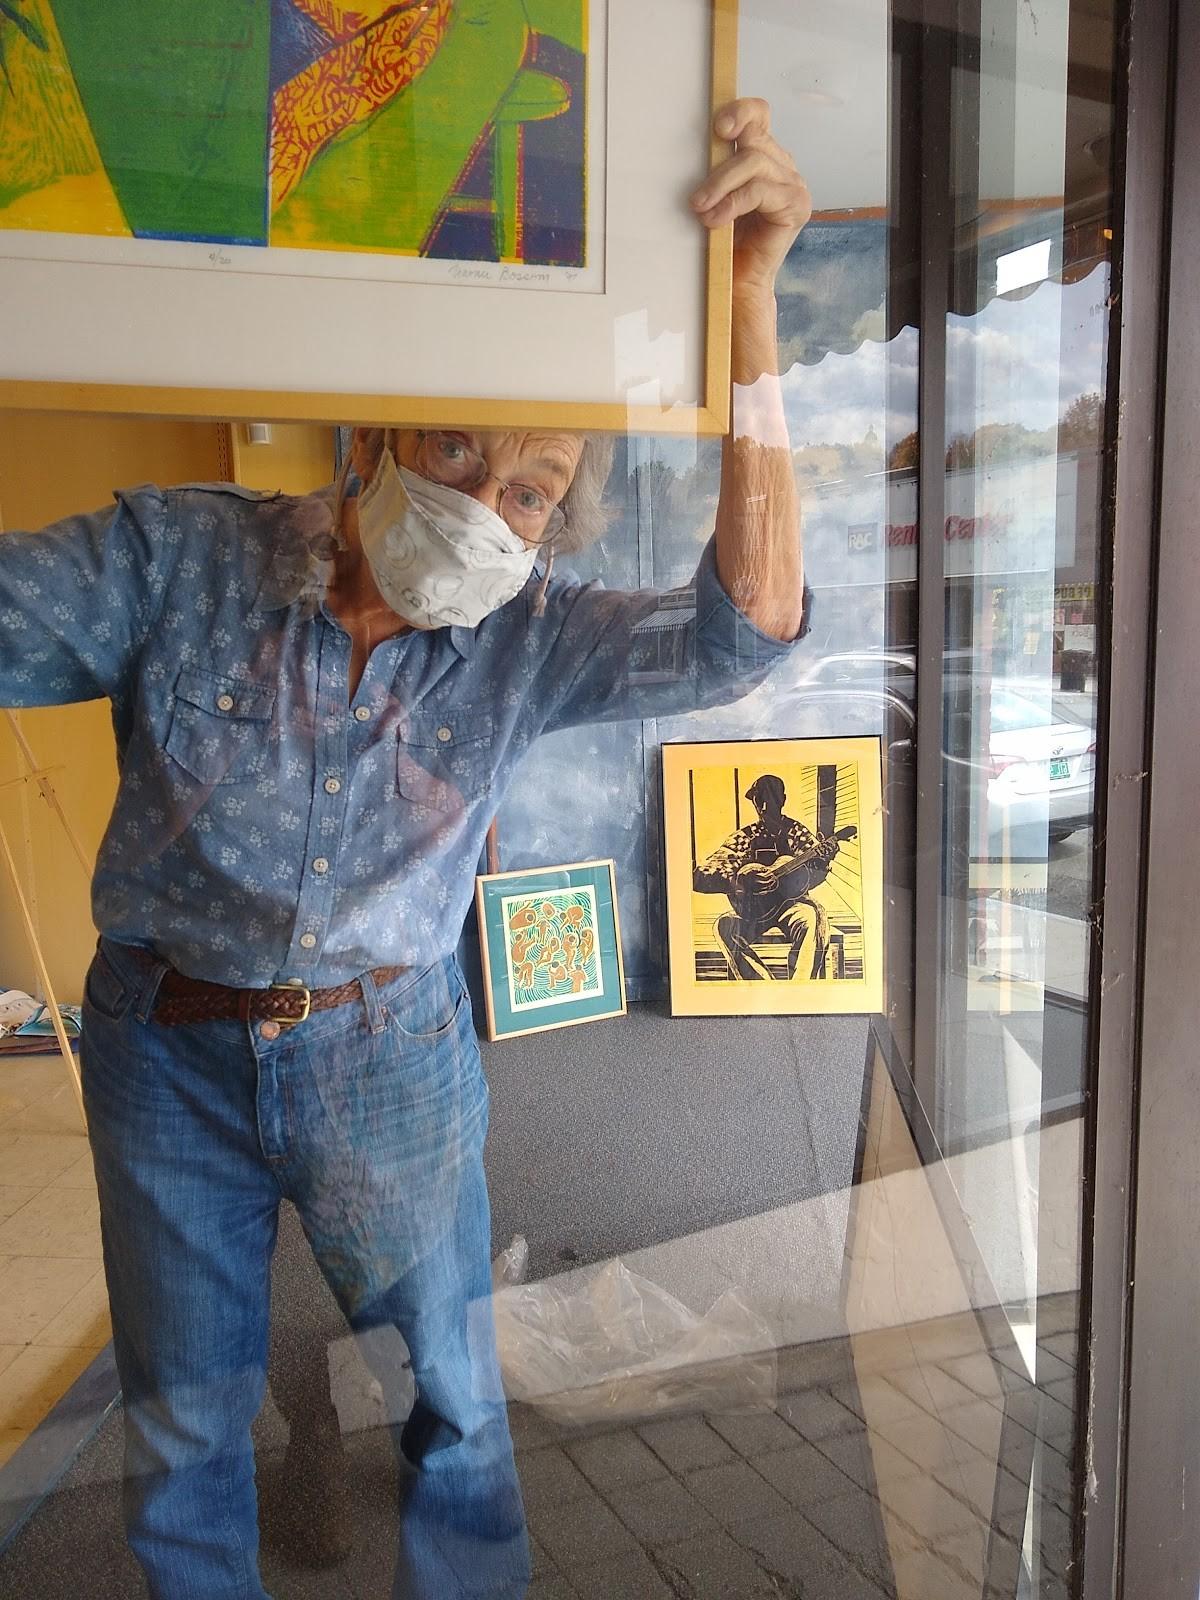 Artist Naomi Bossom hangs art in Saint Johnsbury